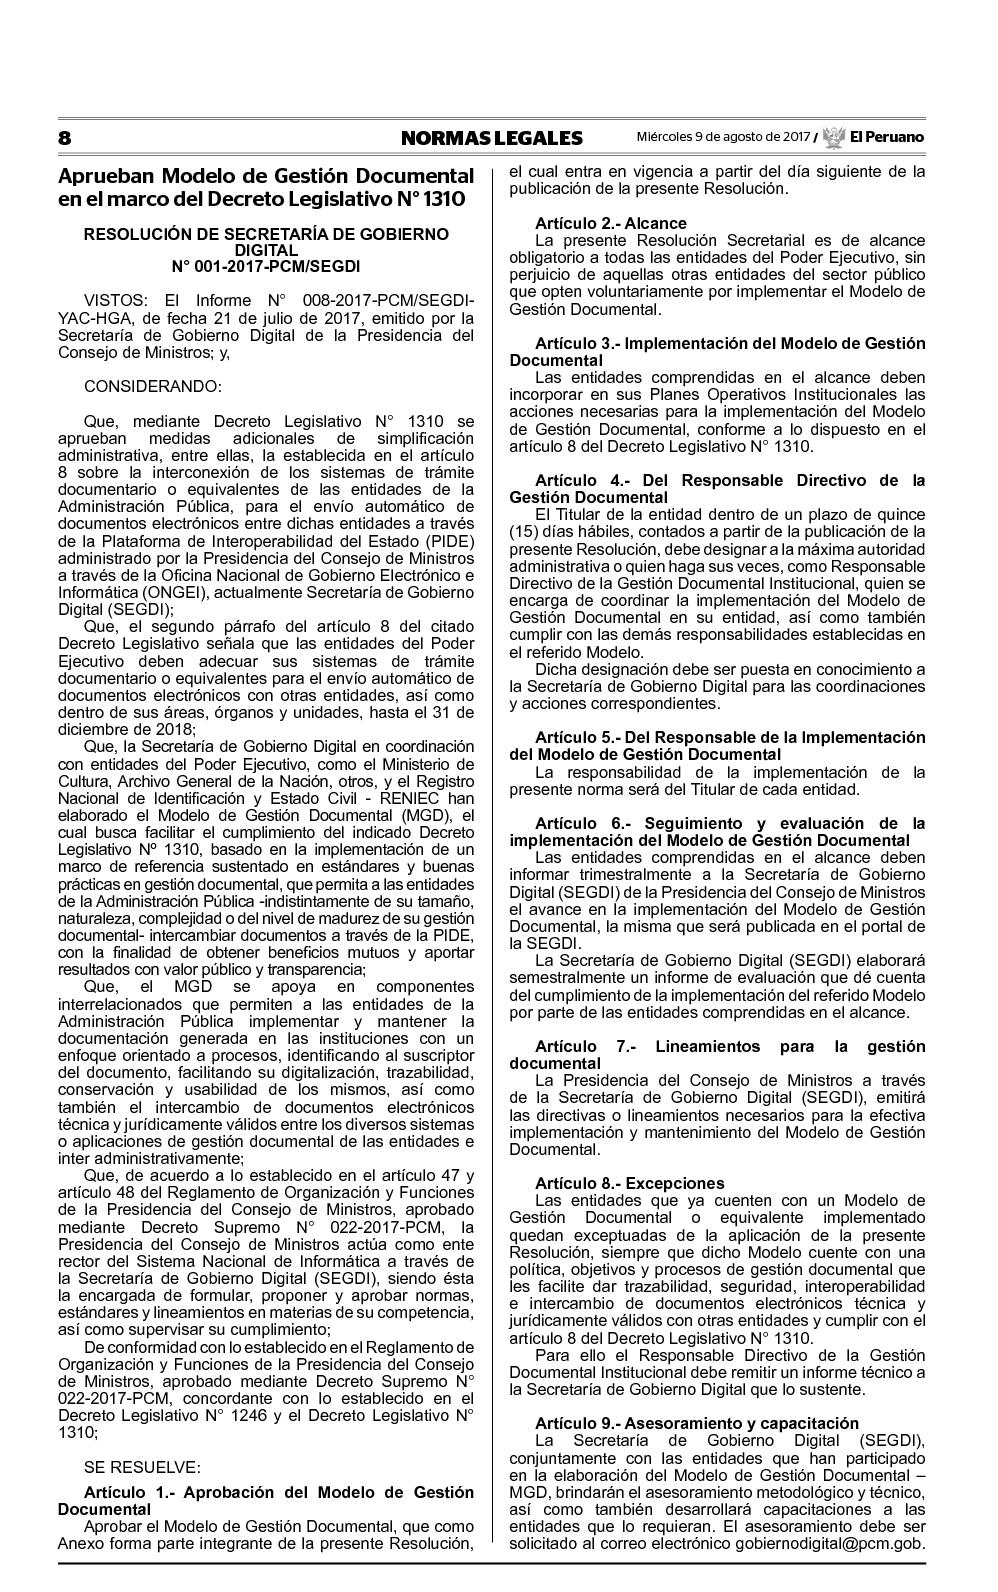 Calaméo - RS 001 2017 PCM SEGDI MODELO DE GESTION DOCUMENTAL